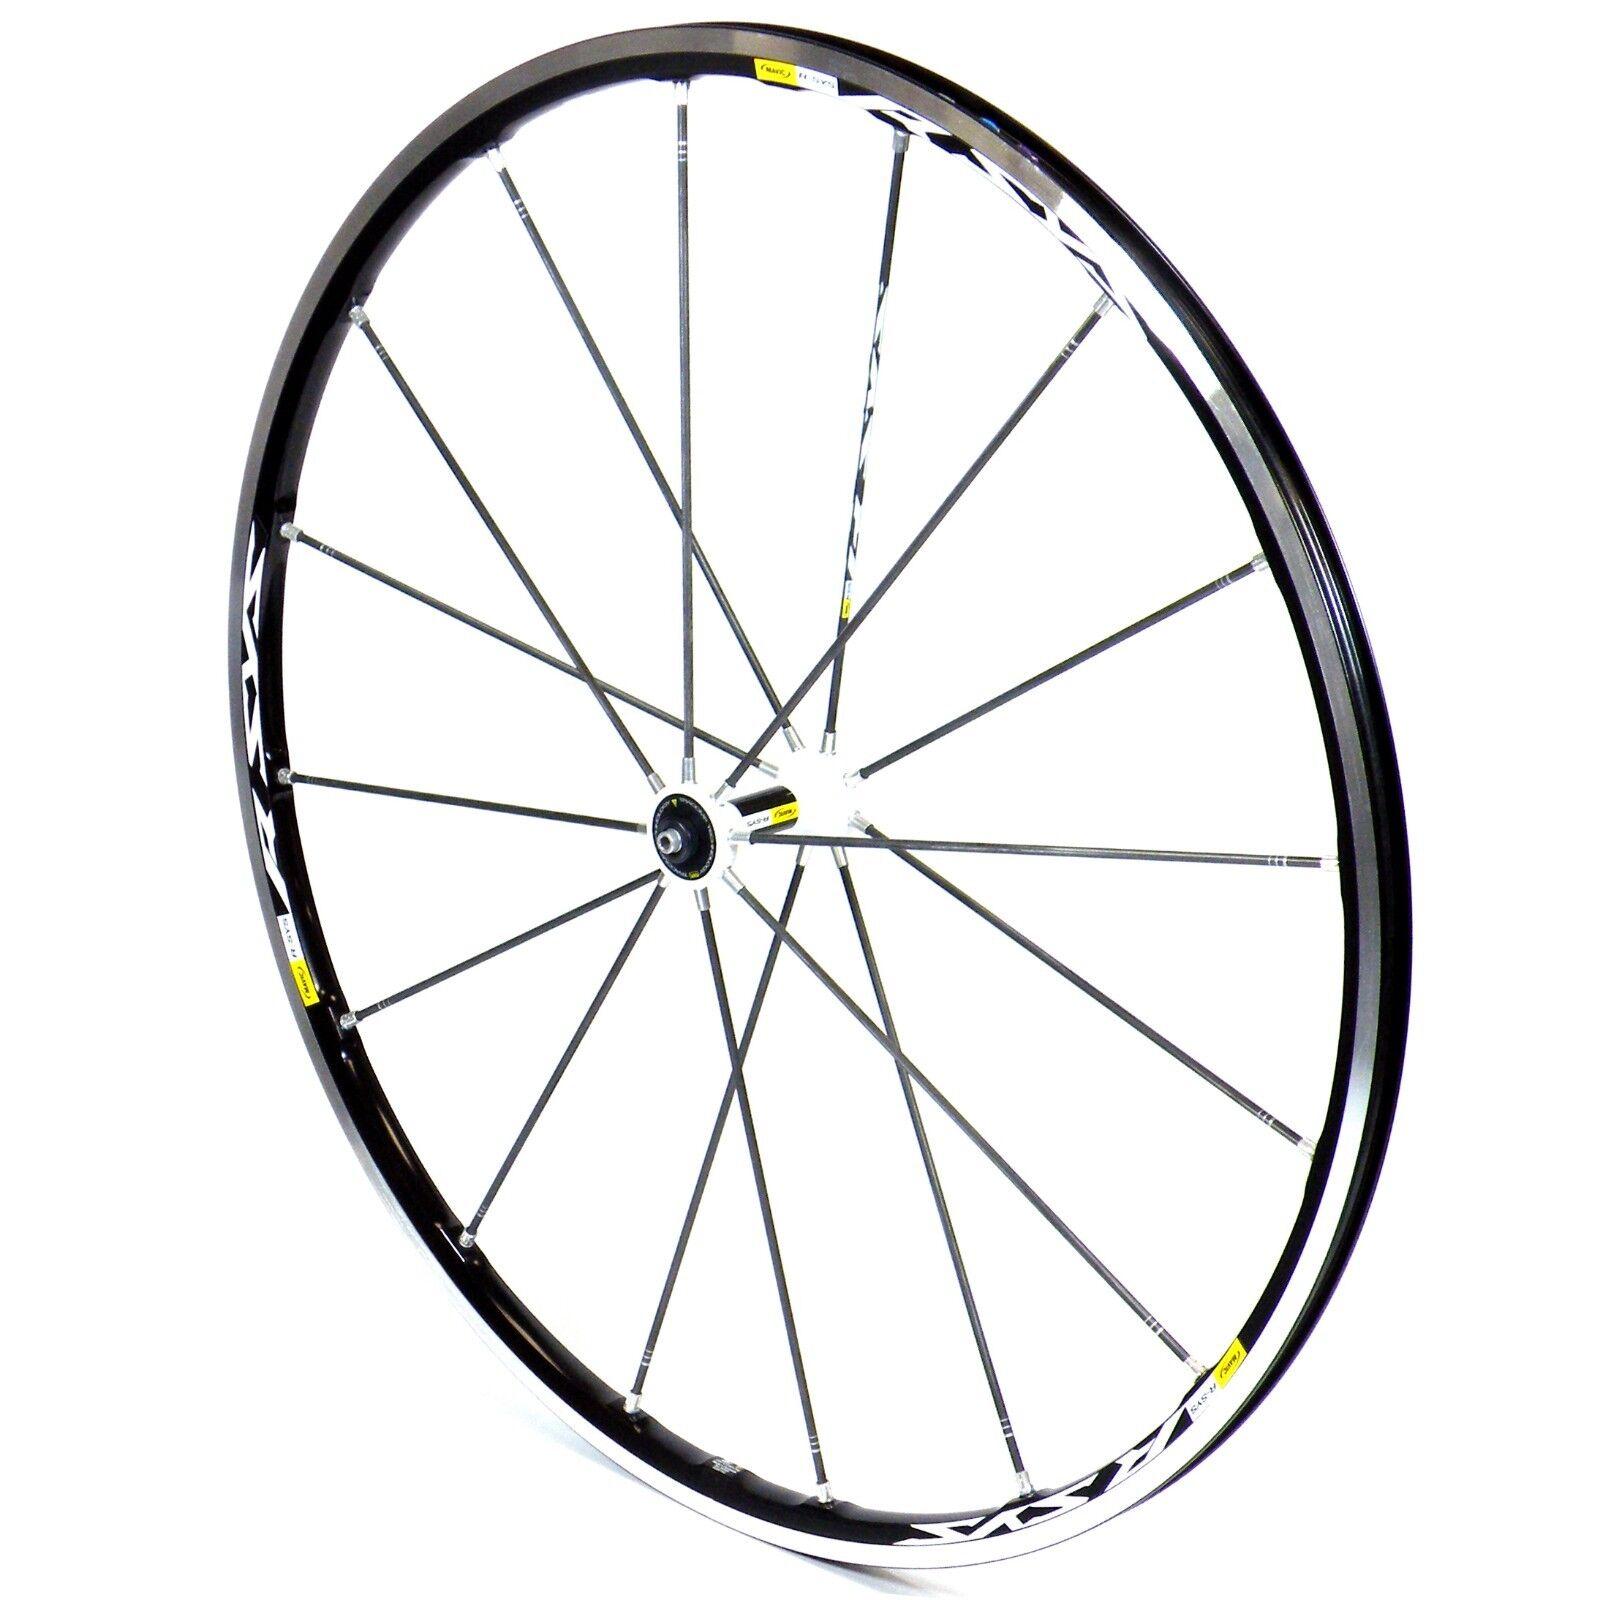 Mavic R-SYS Road Clincher Wheelset - 1400g